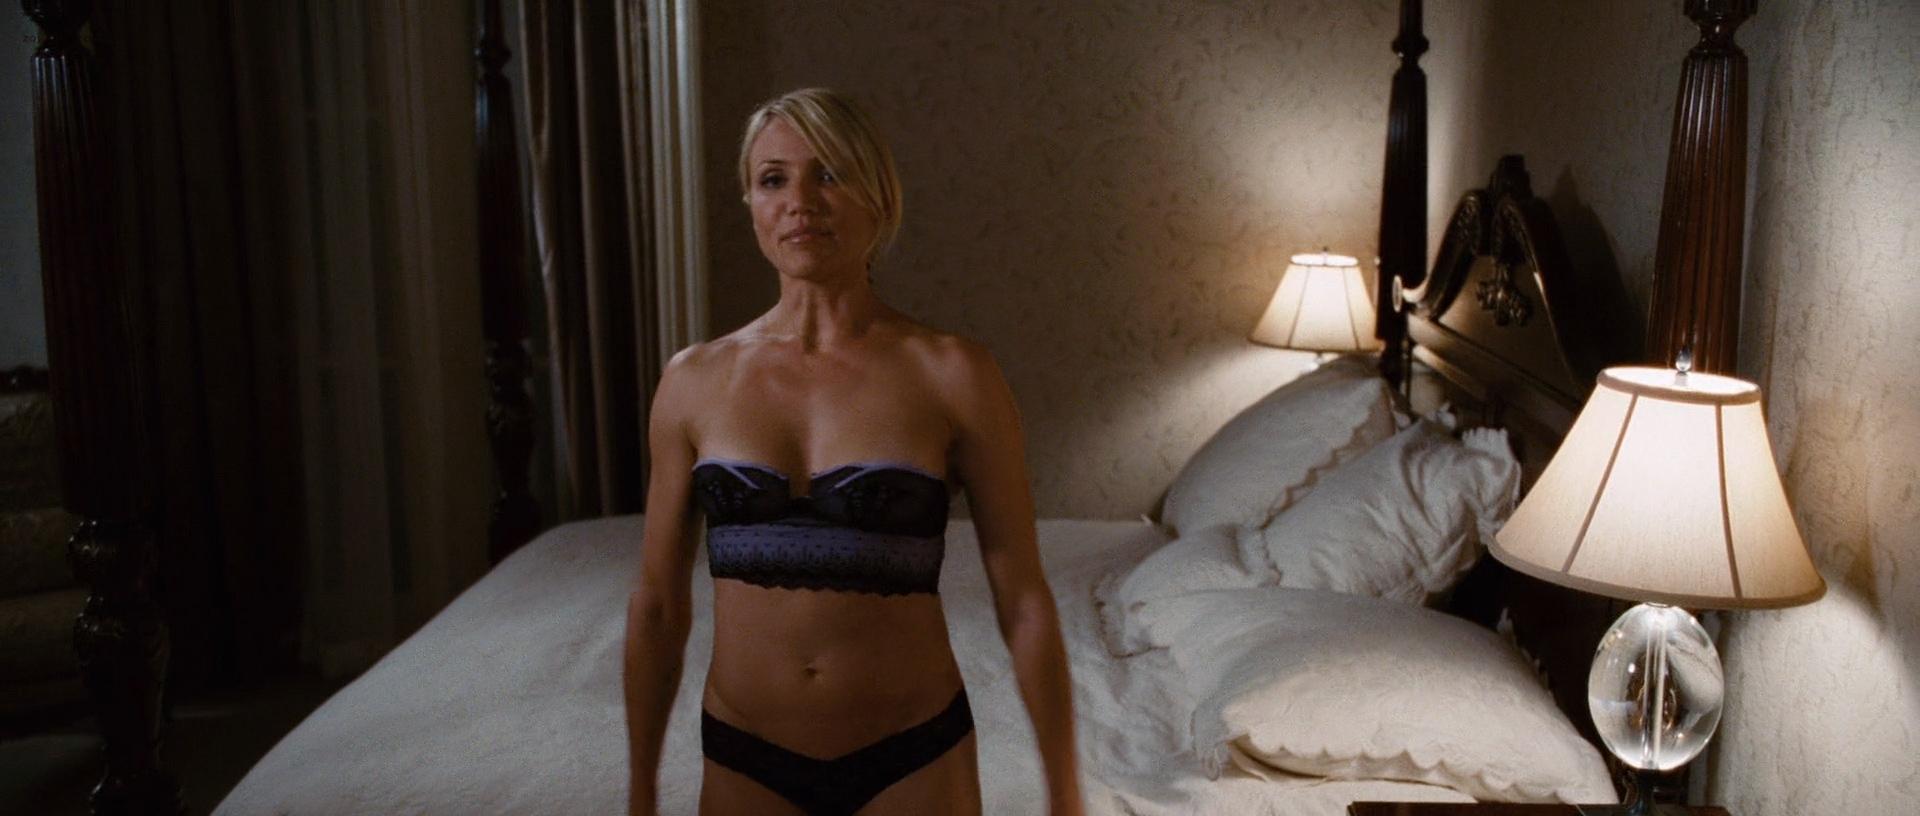 Cameron Diaz hot Krysten Ritter lingerie and Lake Bell hot in undies - What Happens In Vegas (2008) hd1080p (15)